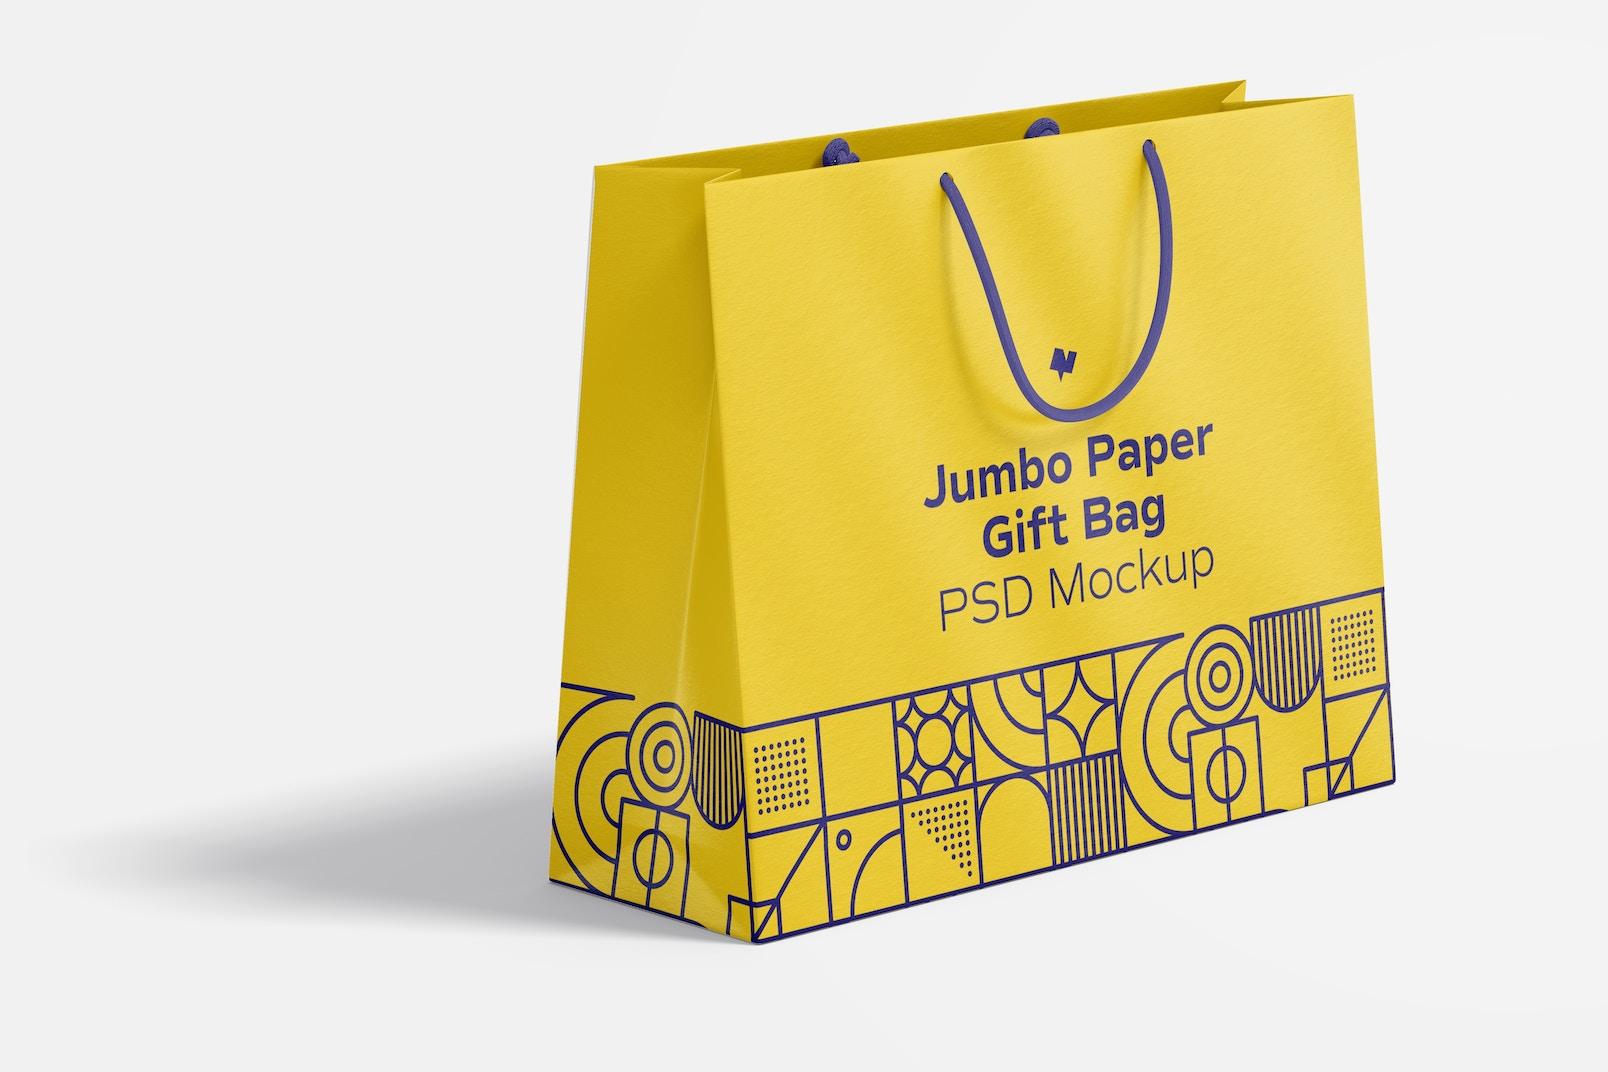 Jumbo Paper Gift Bag With Rope Handle Mockup